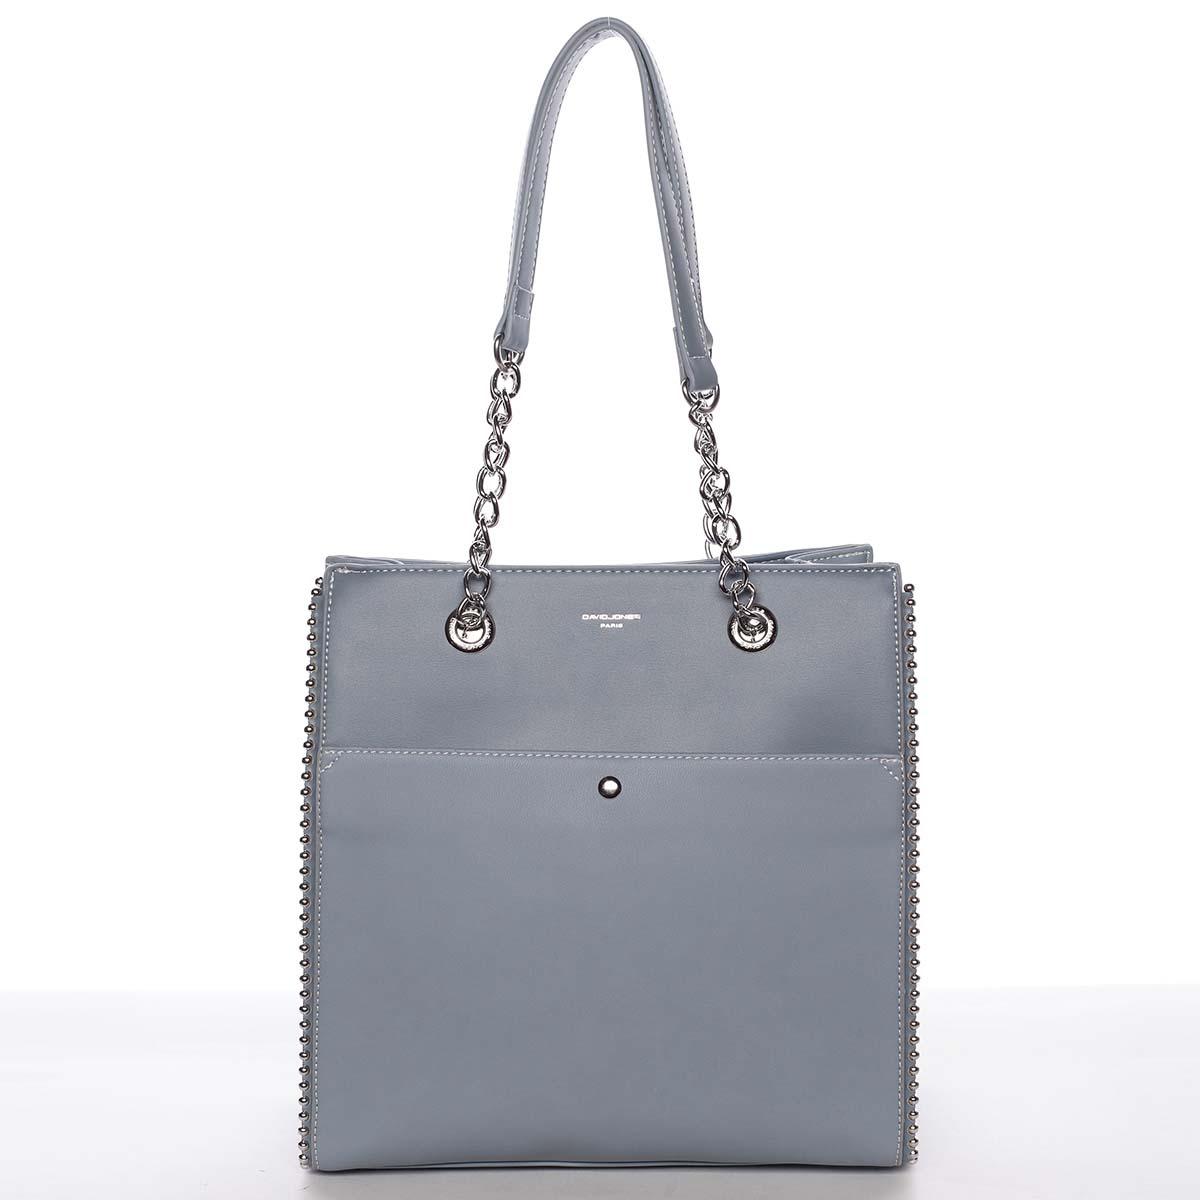 Luxusná a originálna dámska pastelovo modrá kabelka cez plece - David Jones Mishel